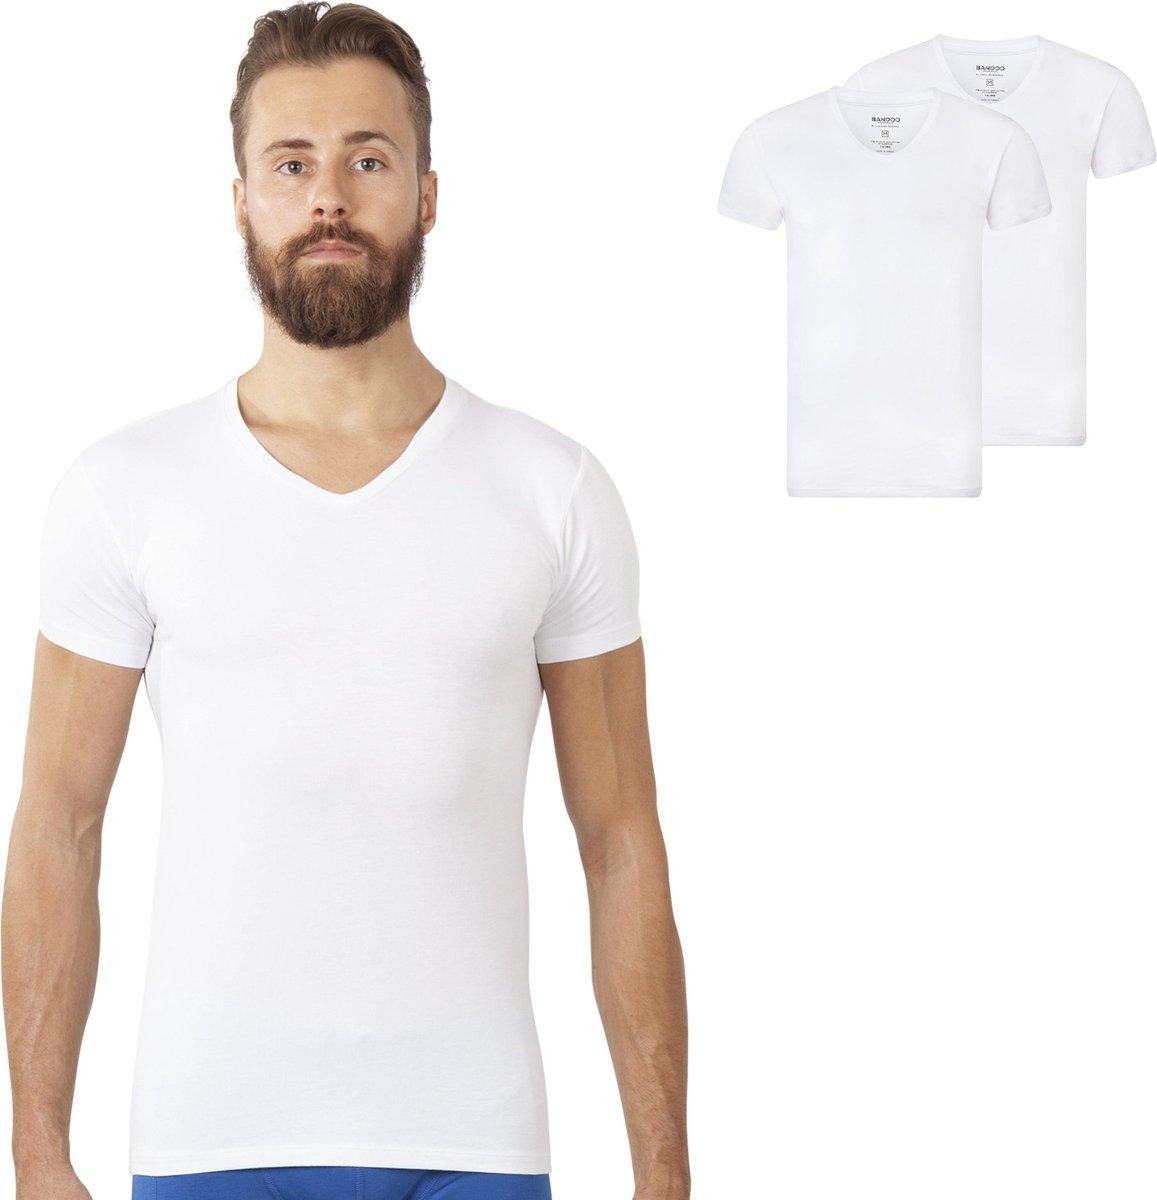 V-Hals Bandoo Underwear heren Bamboe T-shirts Finn - 2-pack - Wit - M